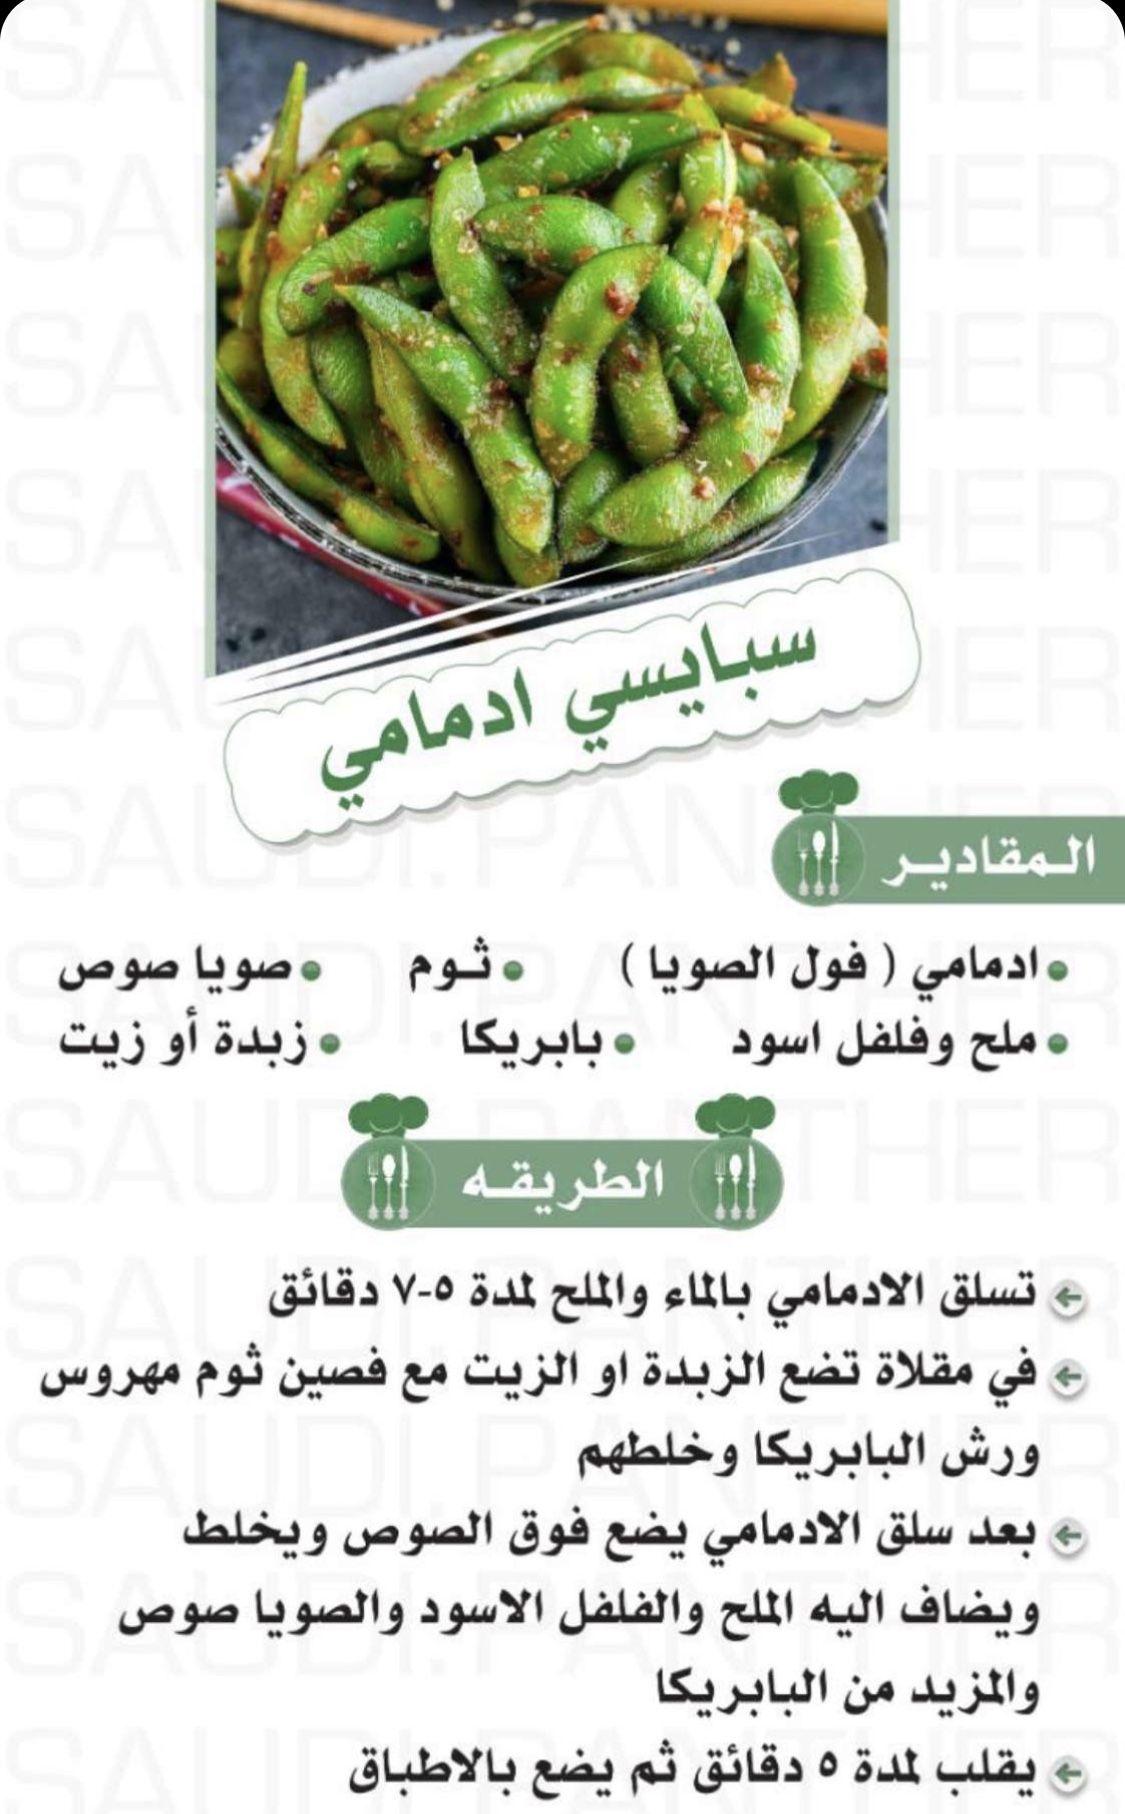 Pin By Amira Hamad On Fooooood Food Receipes Cooking Recipes Desserts Cooking Recipes